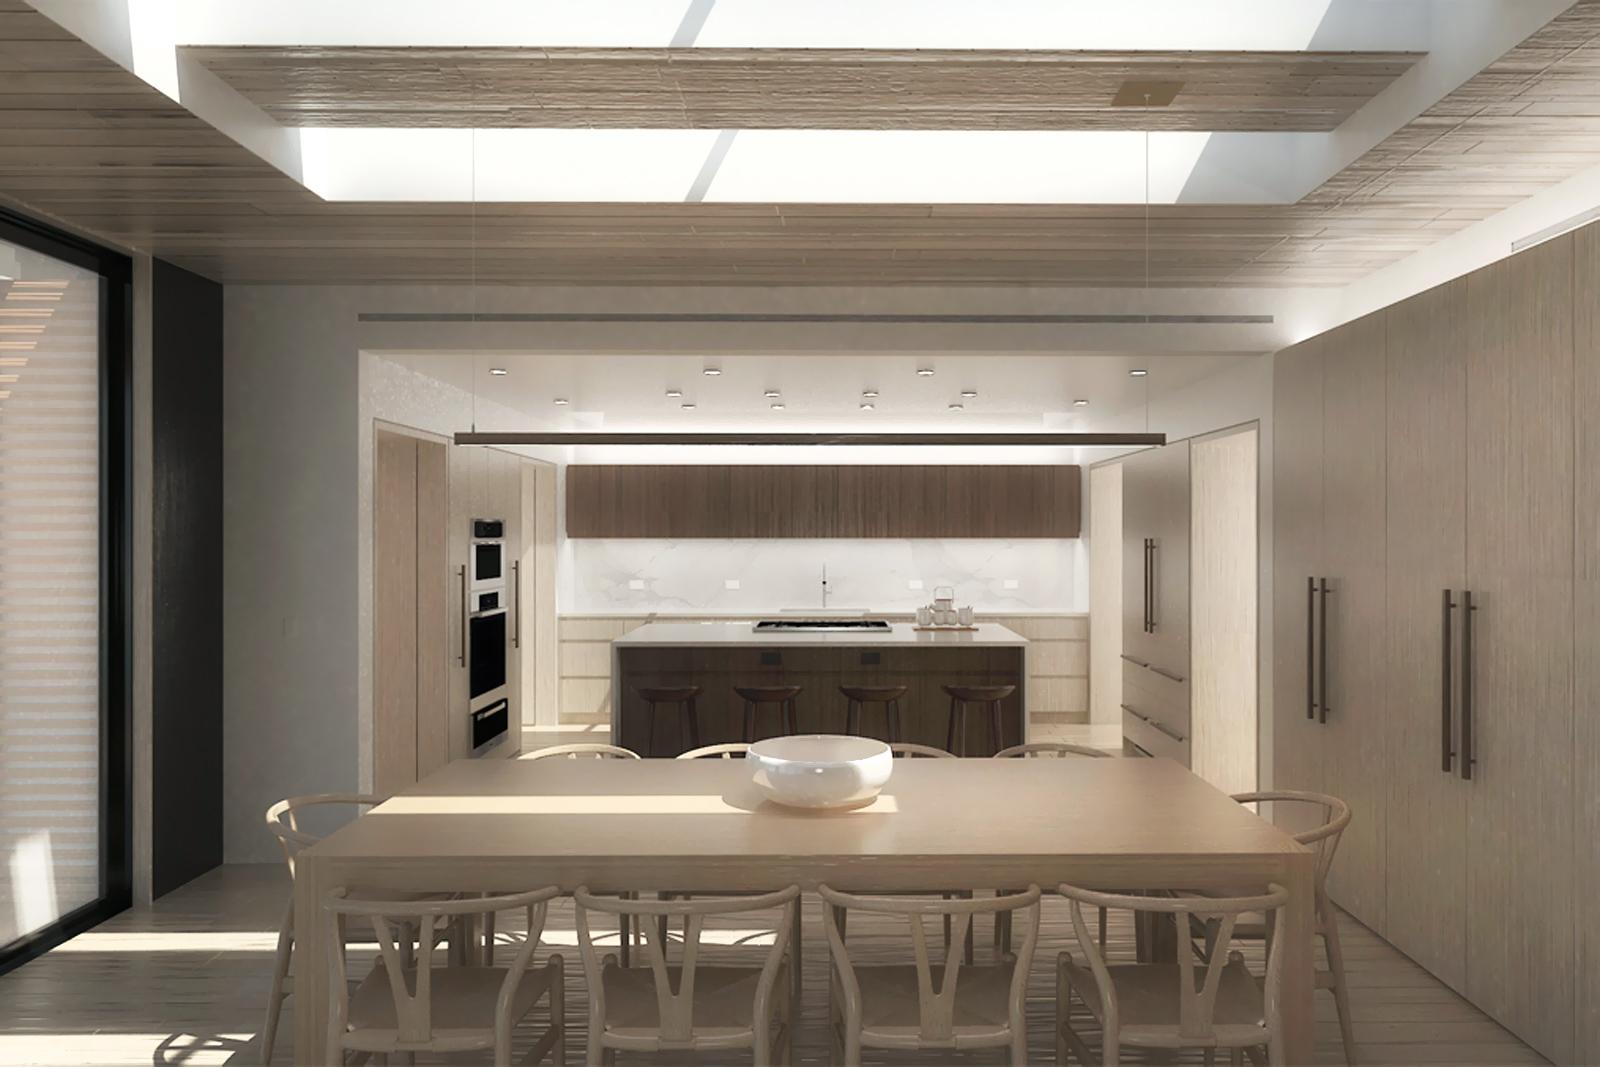 03_Fenimore-kitchen-dining.jpg